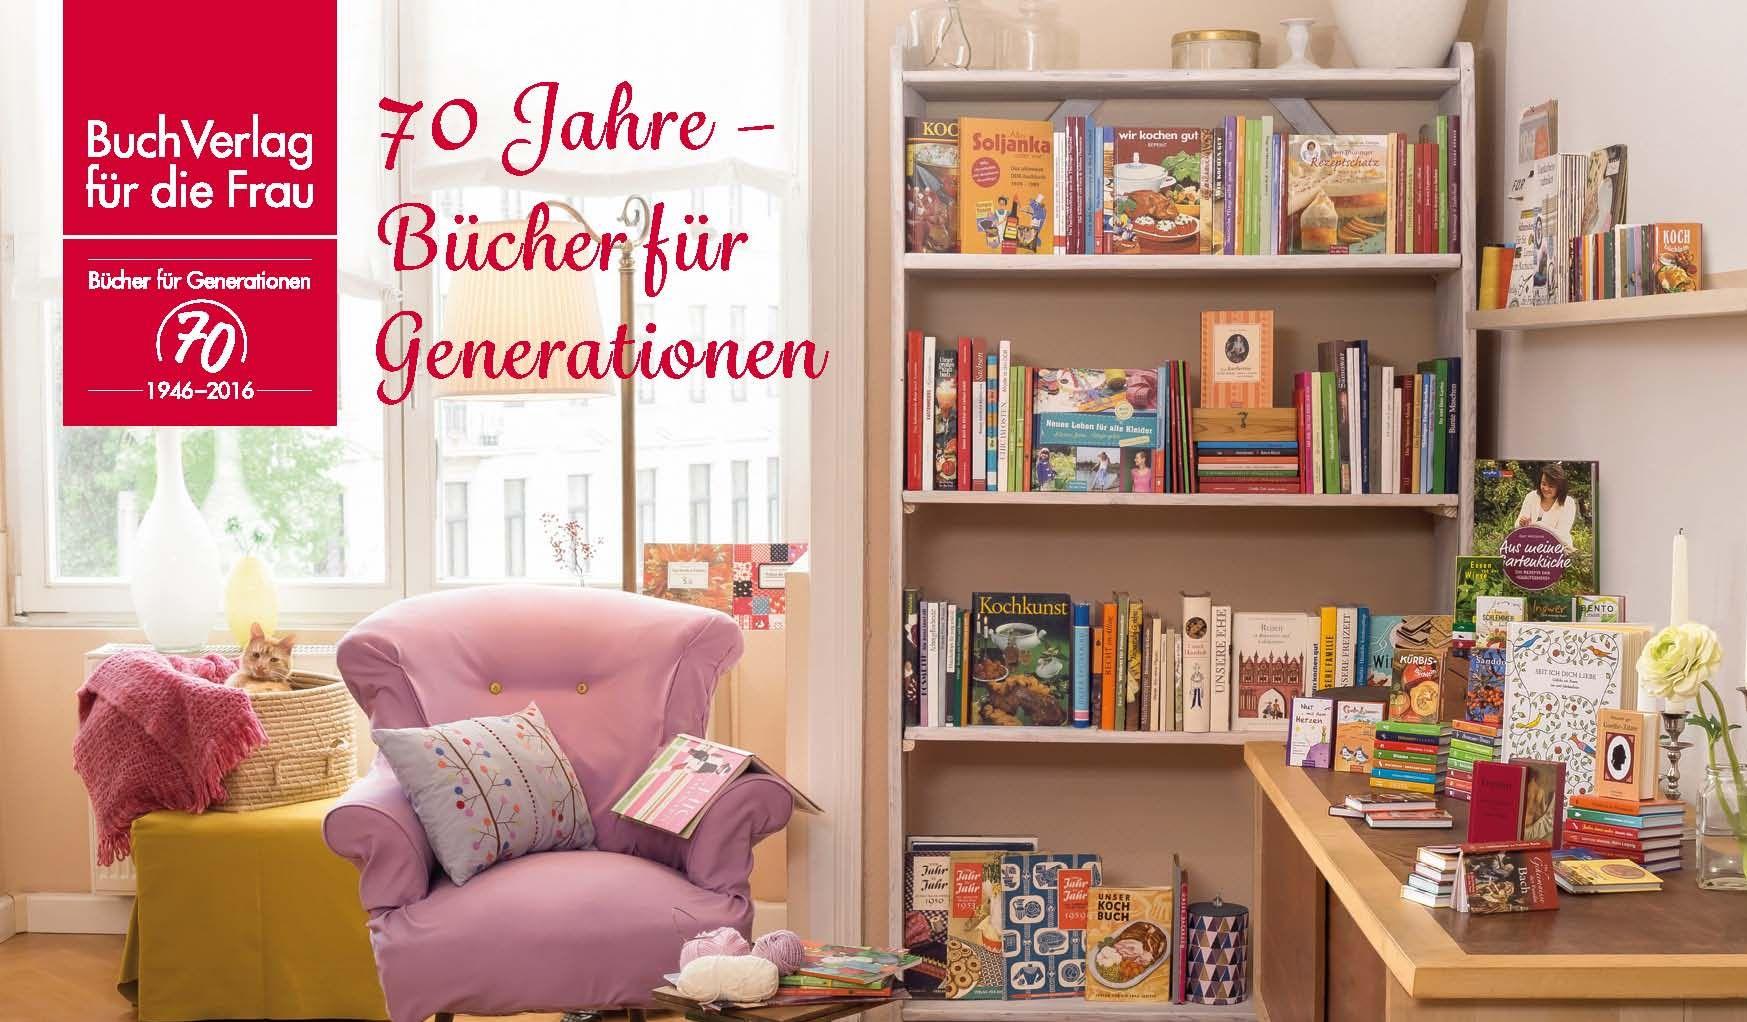 buchverlag f r die frau http buchverlag fuer die. Black Bedroom Furniture Sets. Home Design Ideas